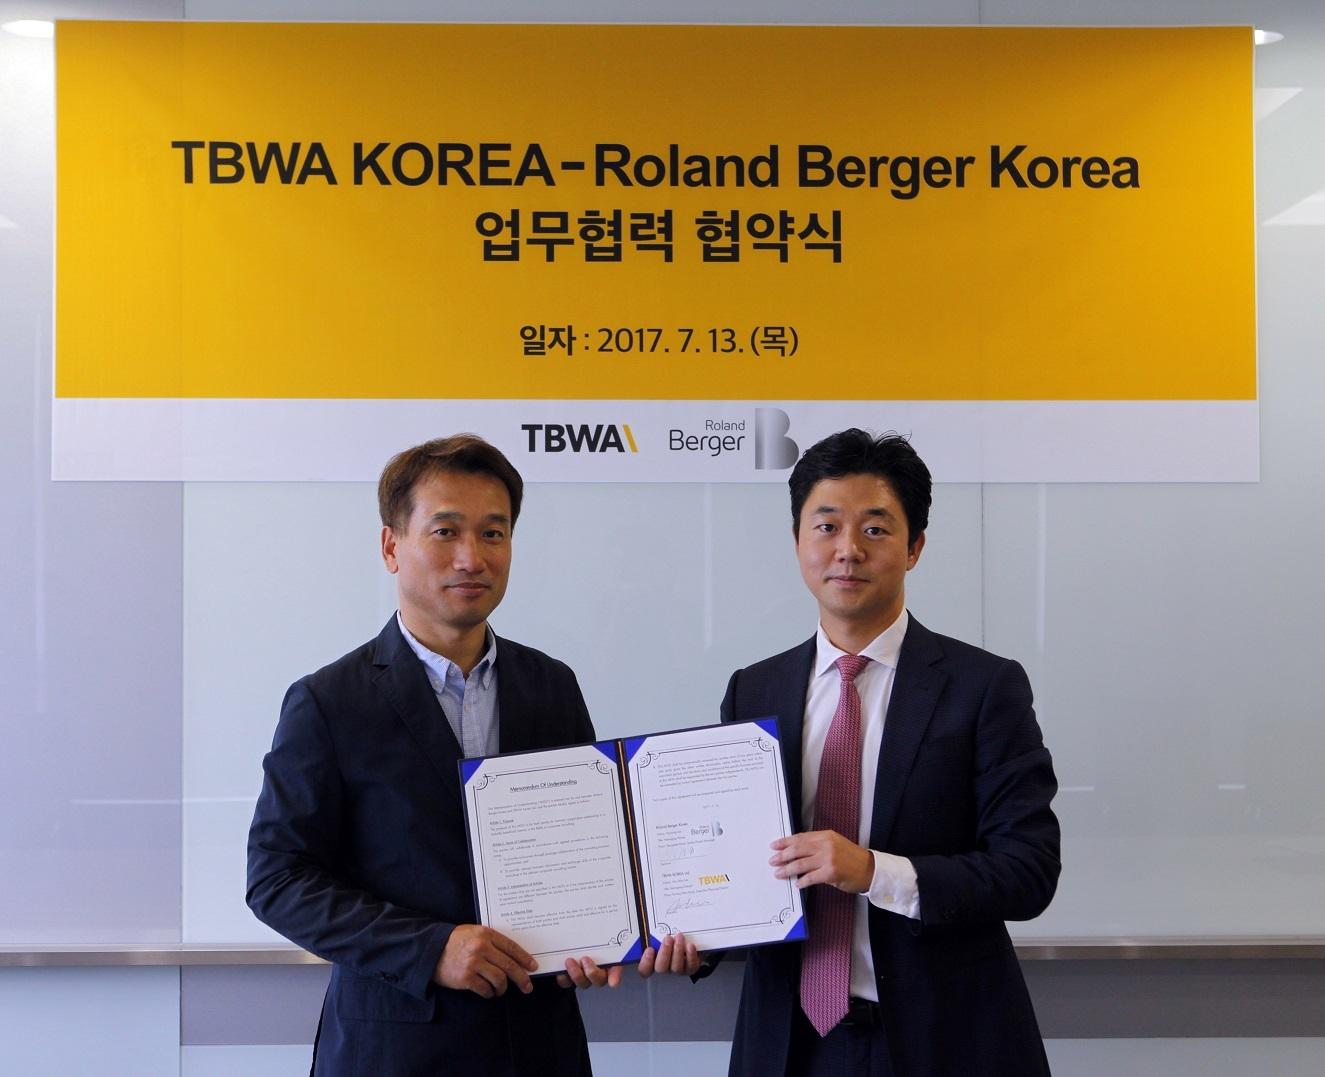 TBWA코리아, RolandBerger와 브랜드 컨설팅 강화 위한 업무협약 체결